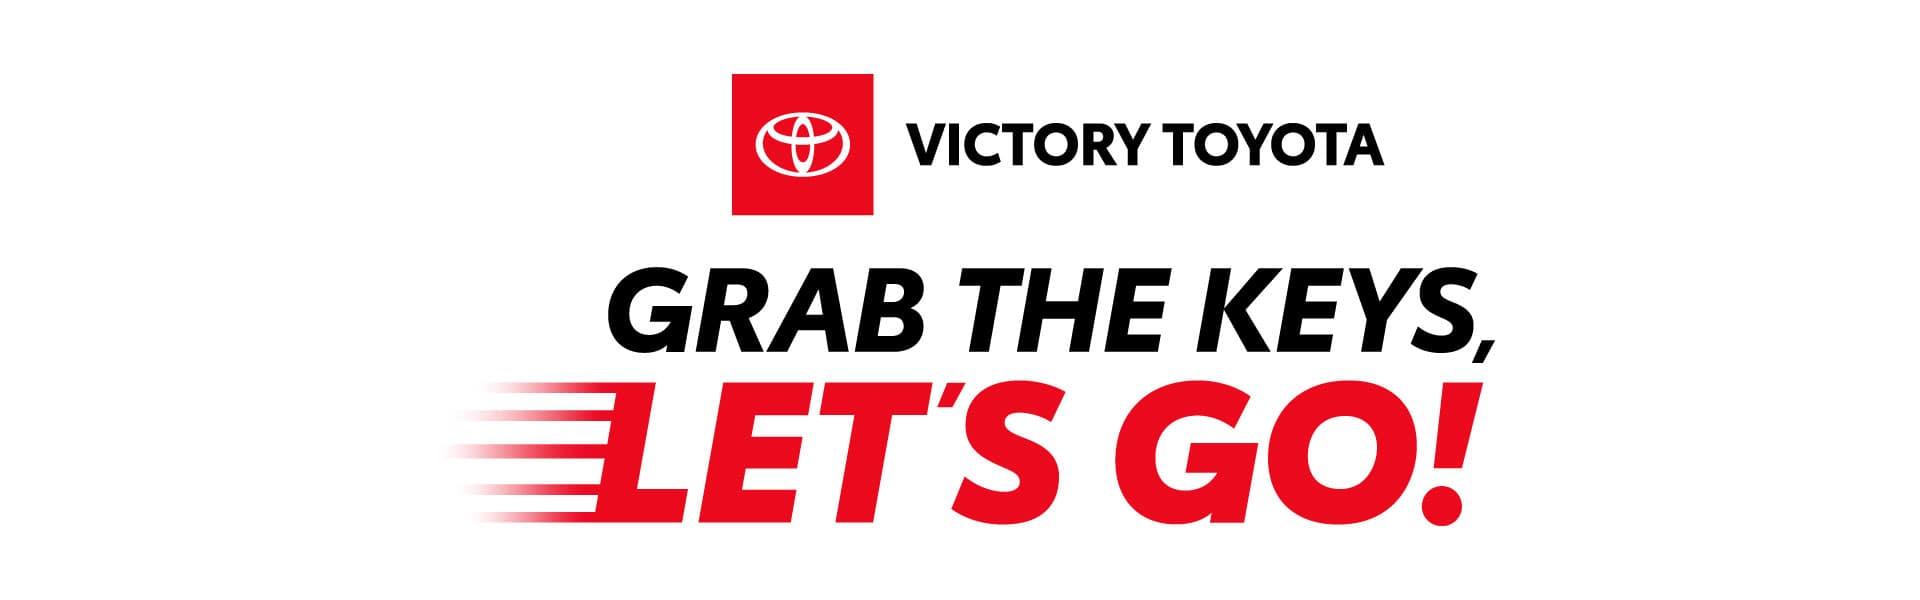 Grab The Keys, Let's Go!